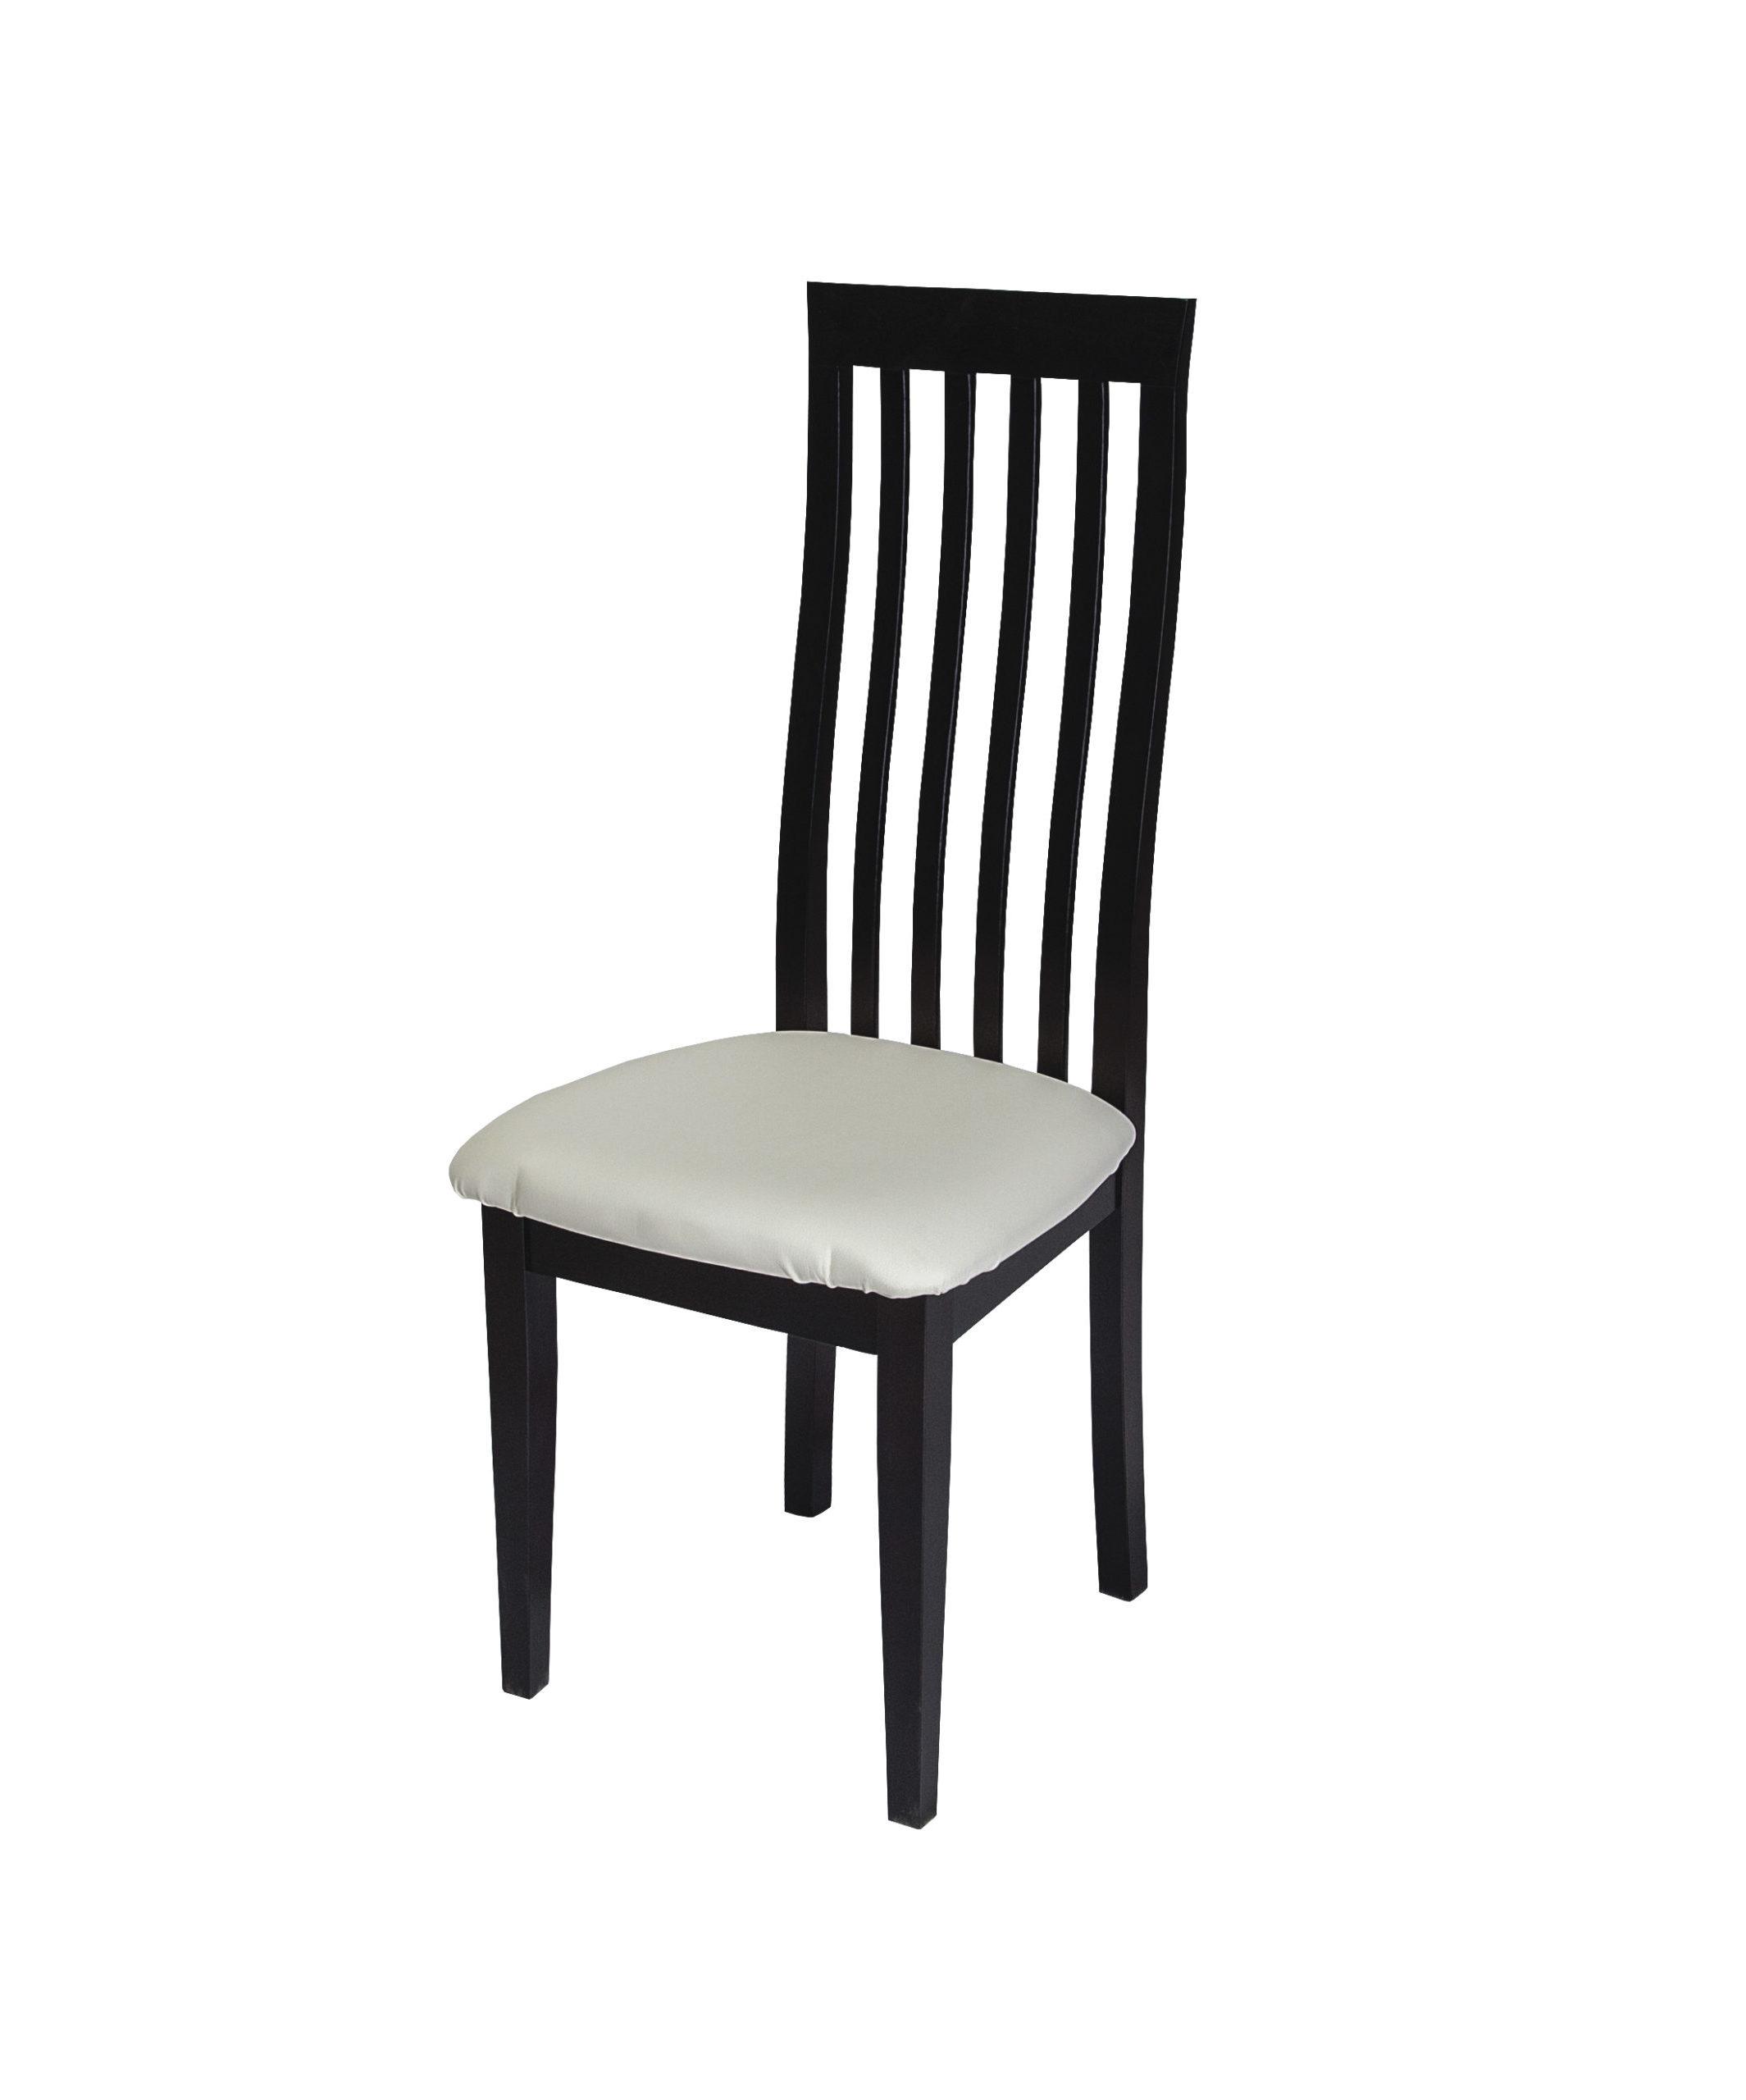 6401. Каркас стула из массива бука.